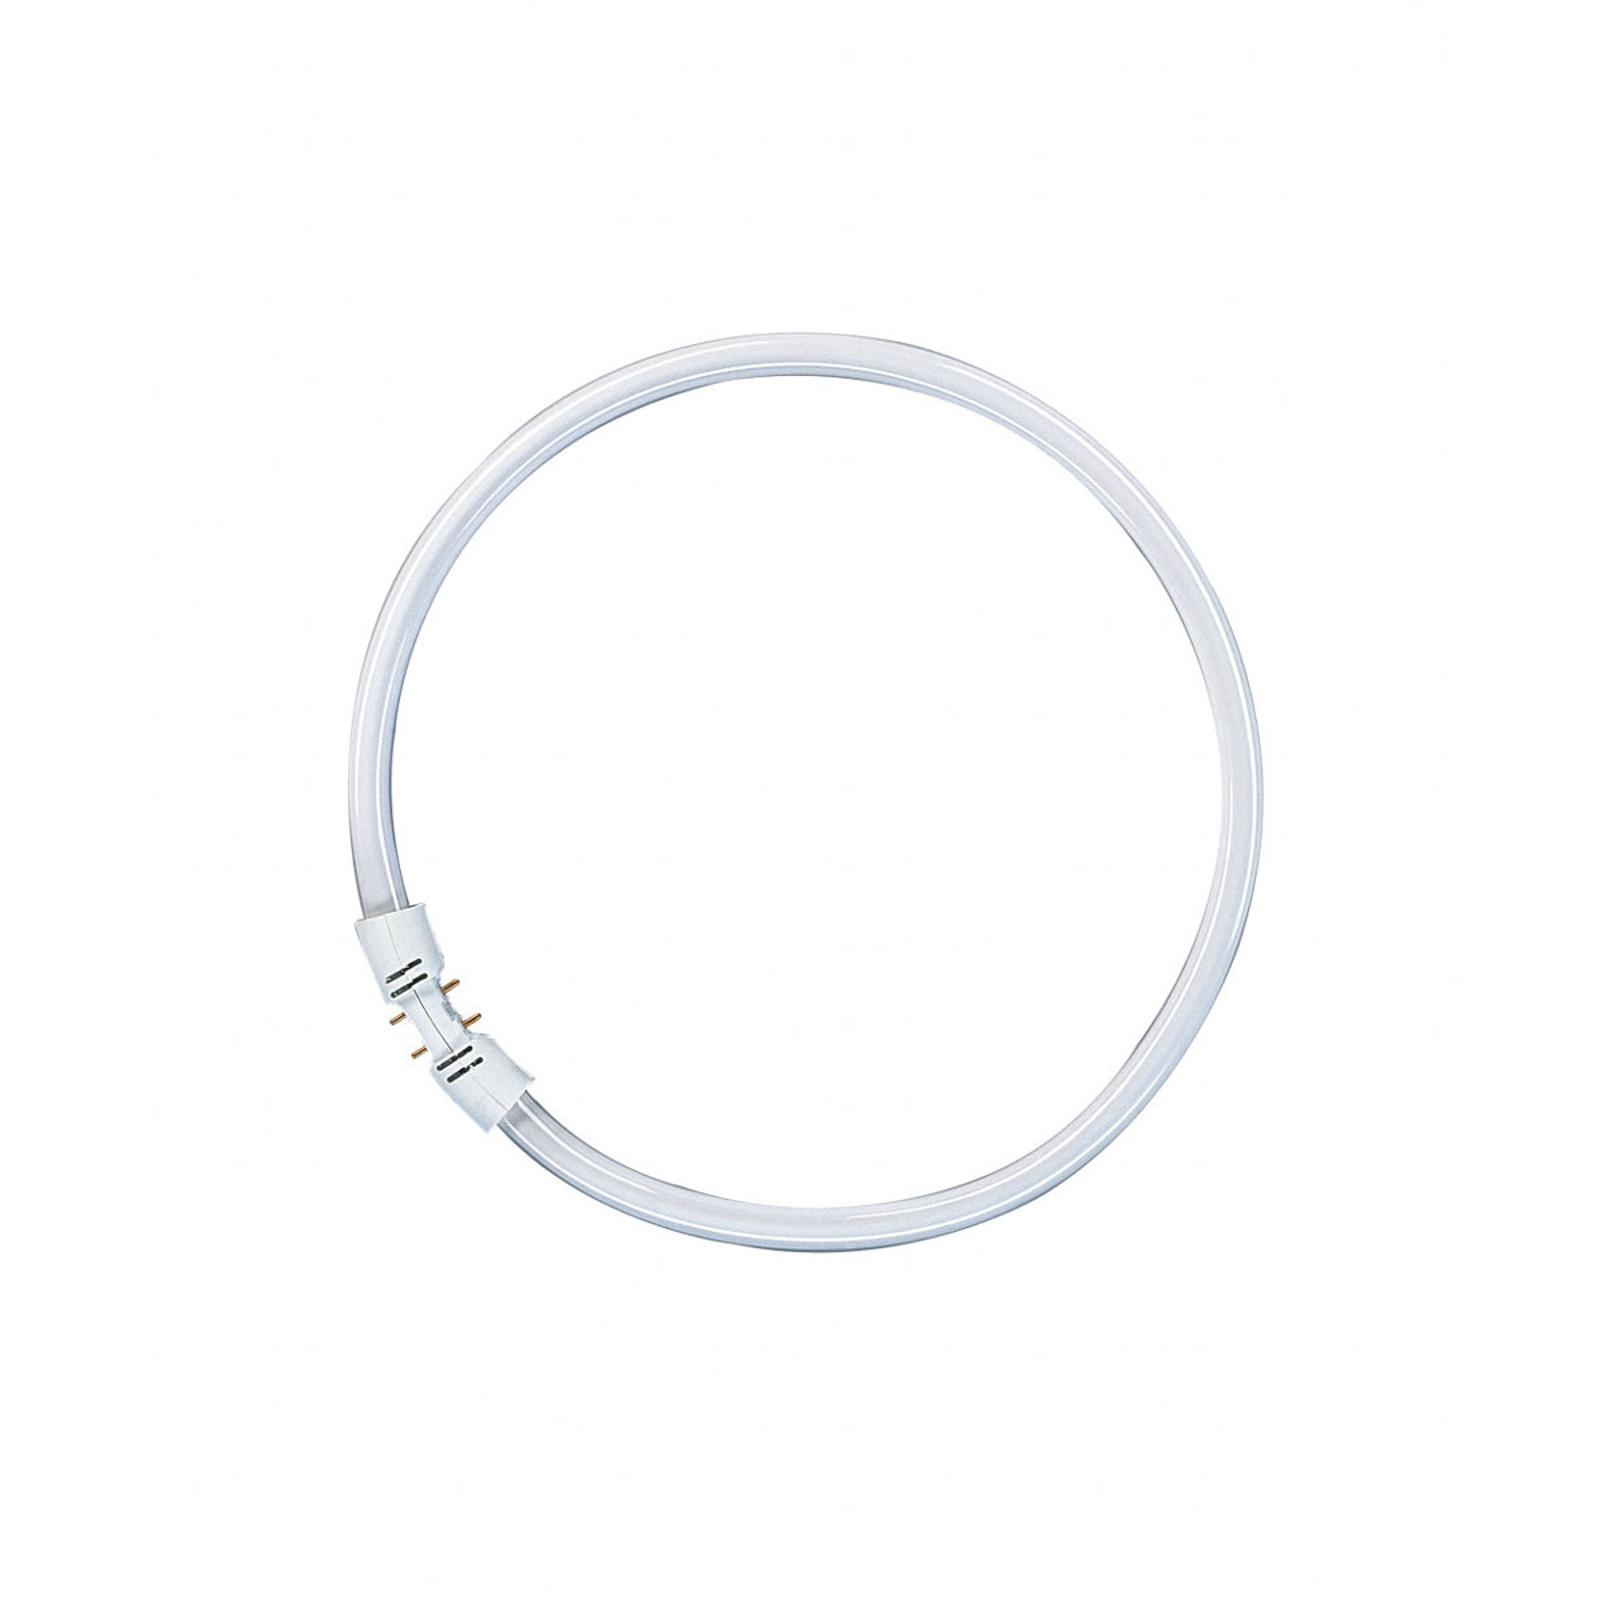 2Gx13 LUMILUX T5 Ring-lysstoffpære 55W 840